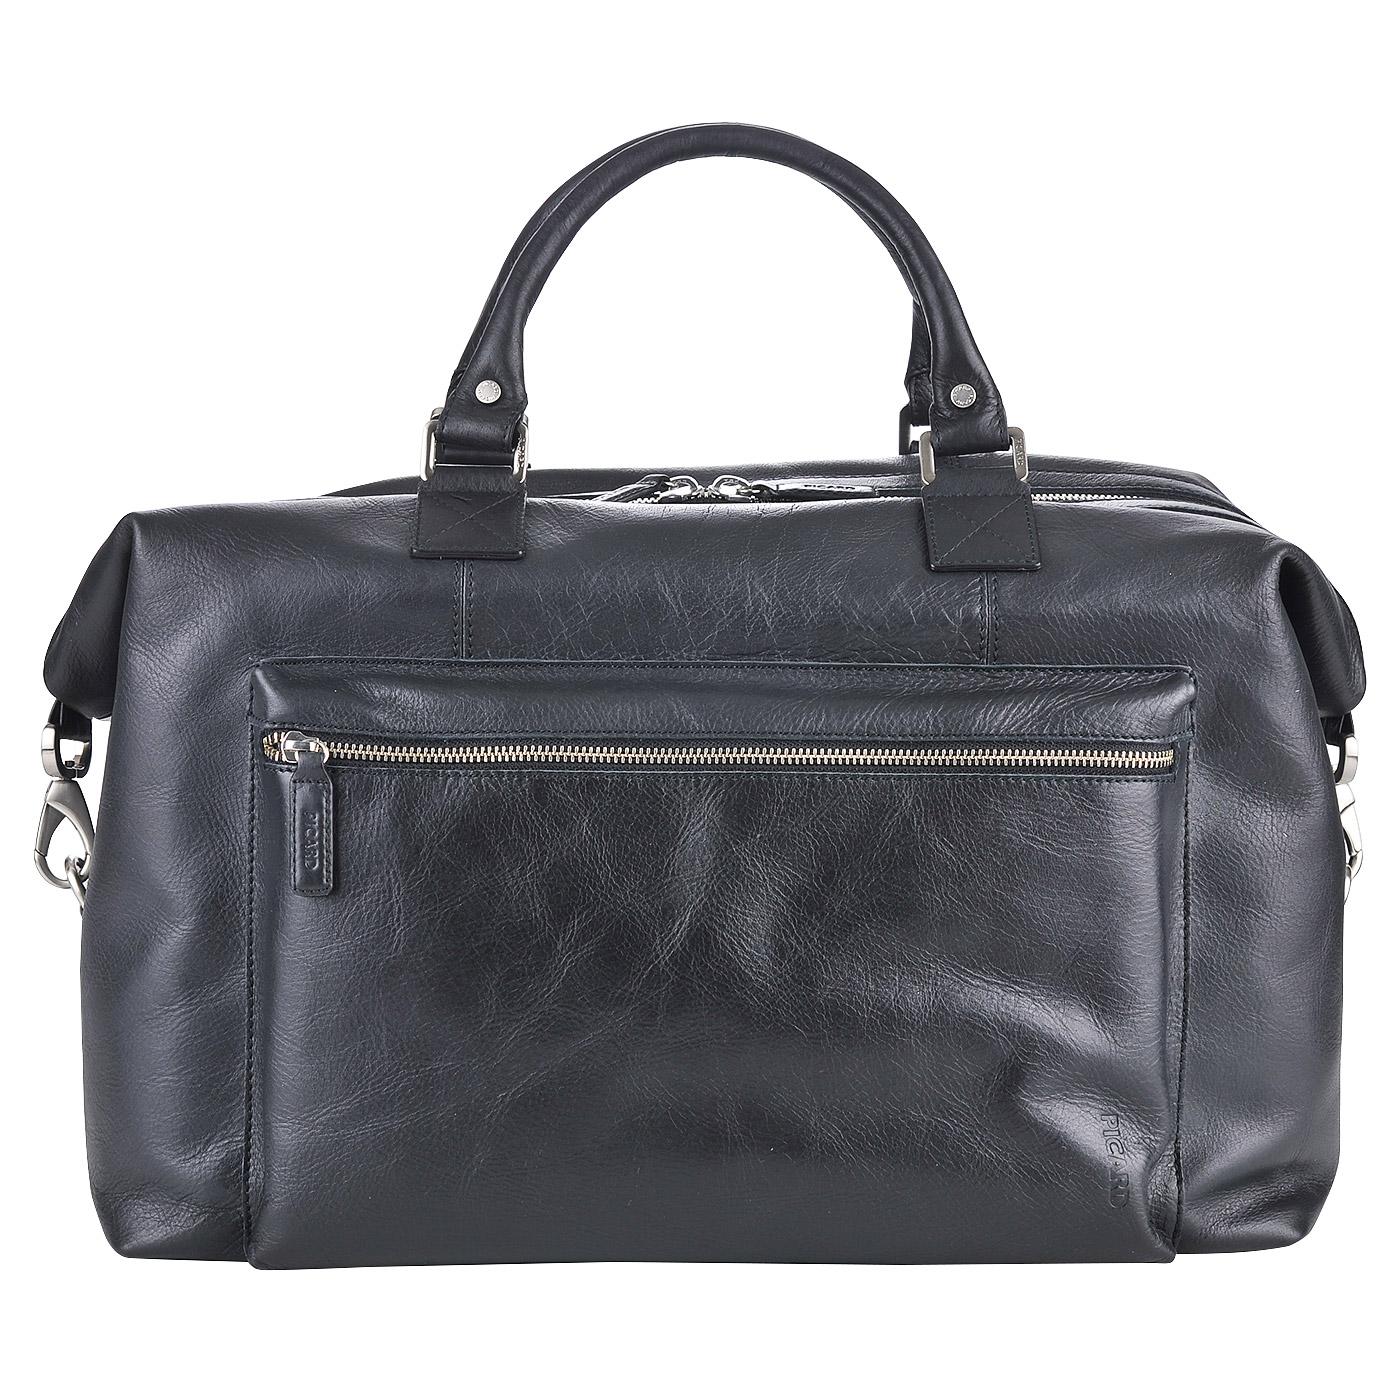 dc1c5ad392b7 Мужская кожаная сумка дорожная Picard Buddy 4235 51B_schwarz ...